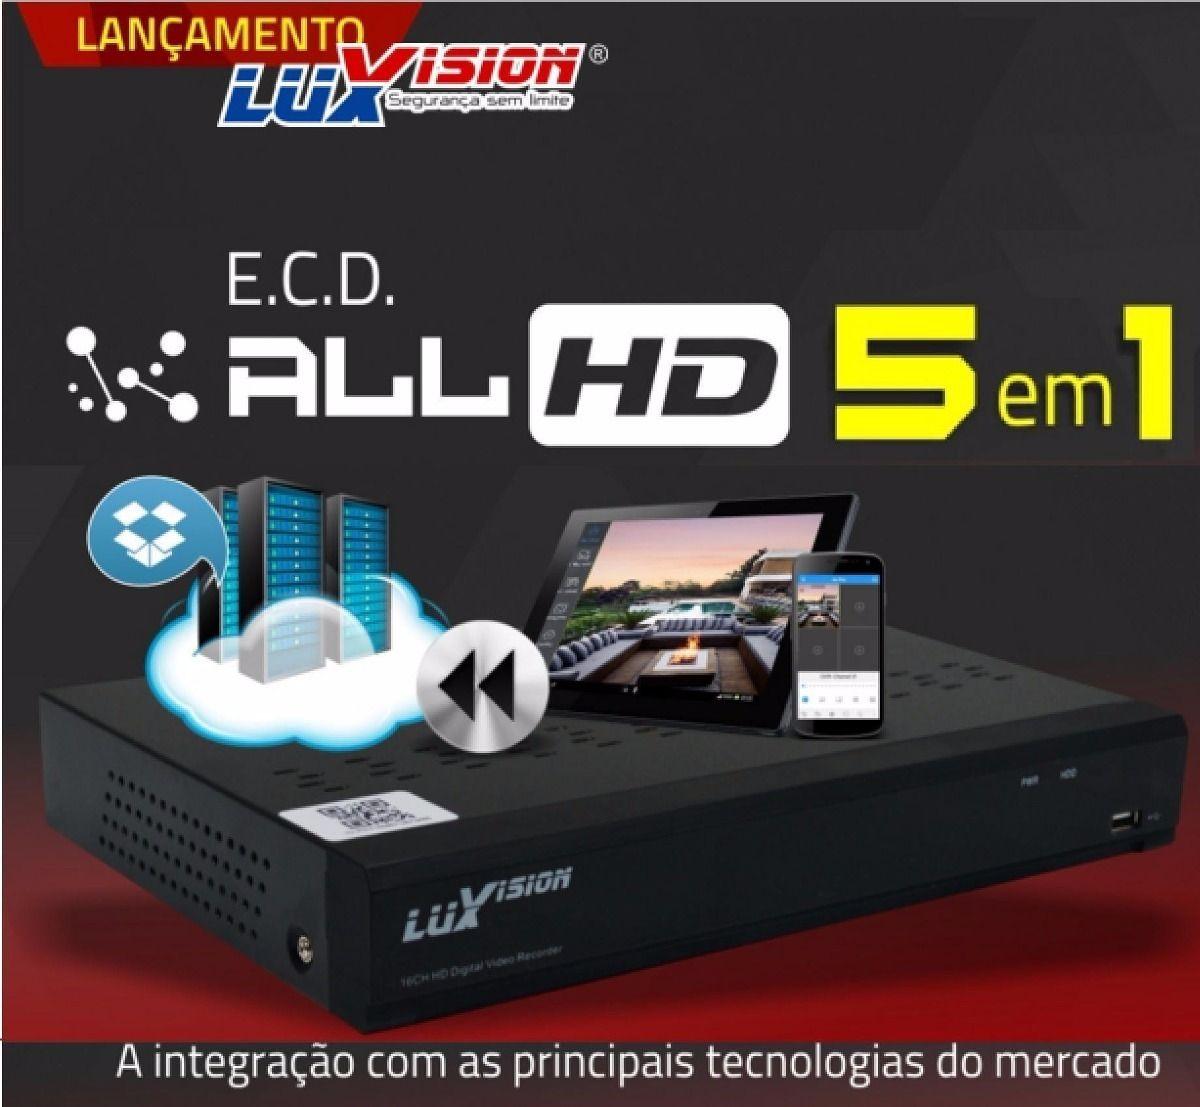 Dvr Stand Alone Gravador Fullhd 8 Canais 5x1 Ecd Luxvision